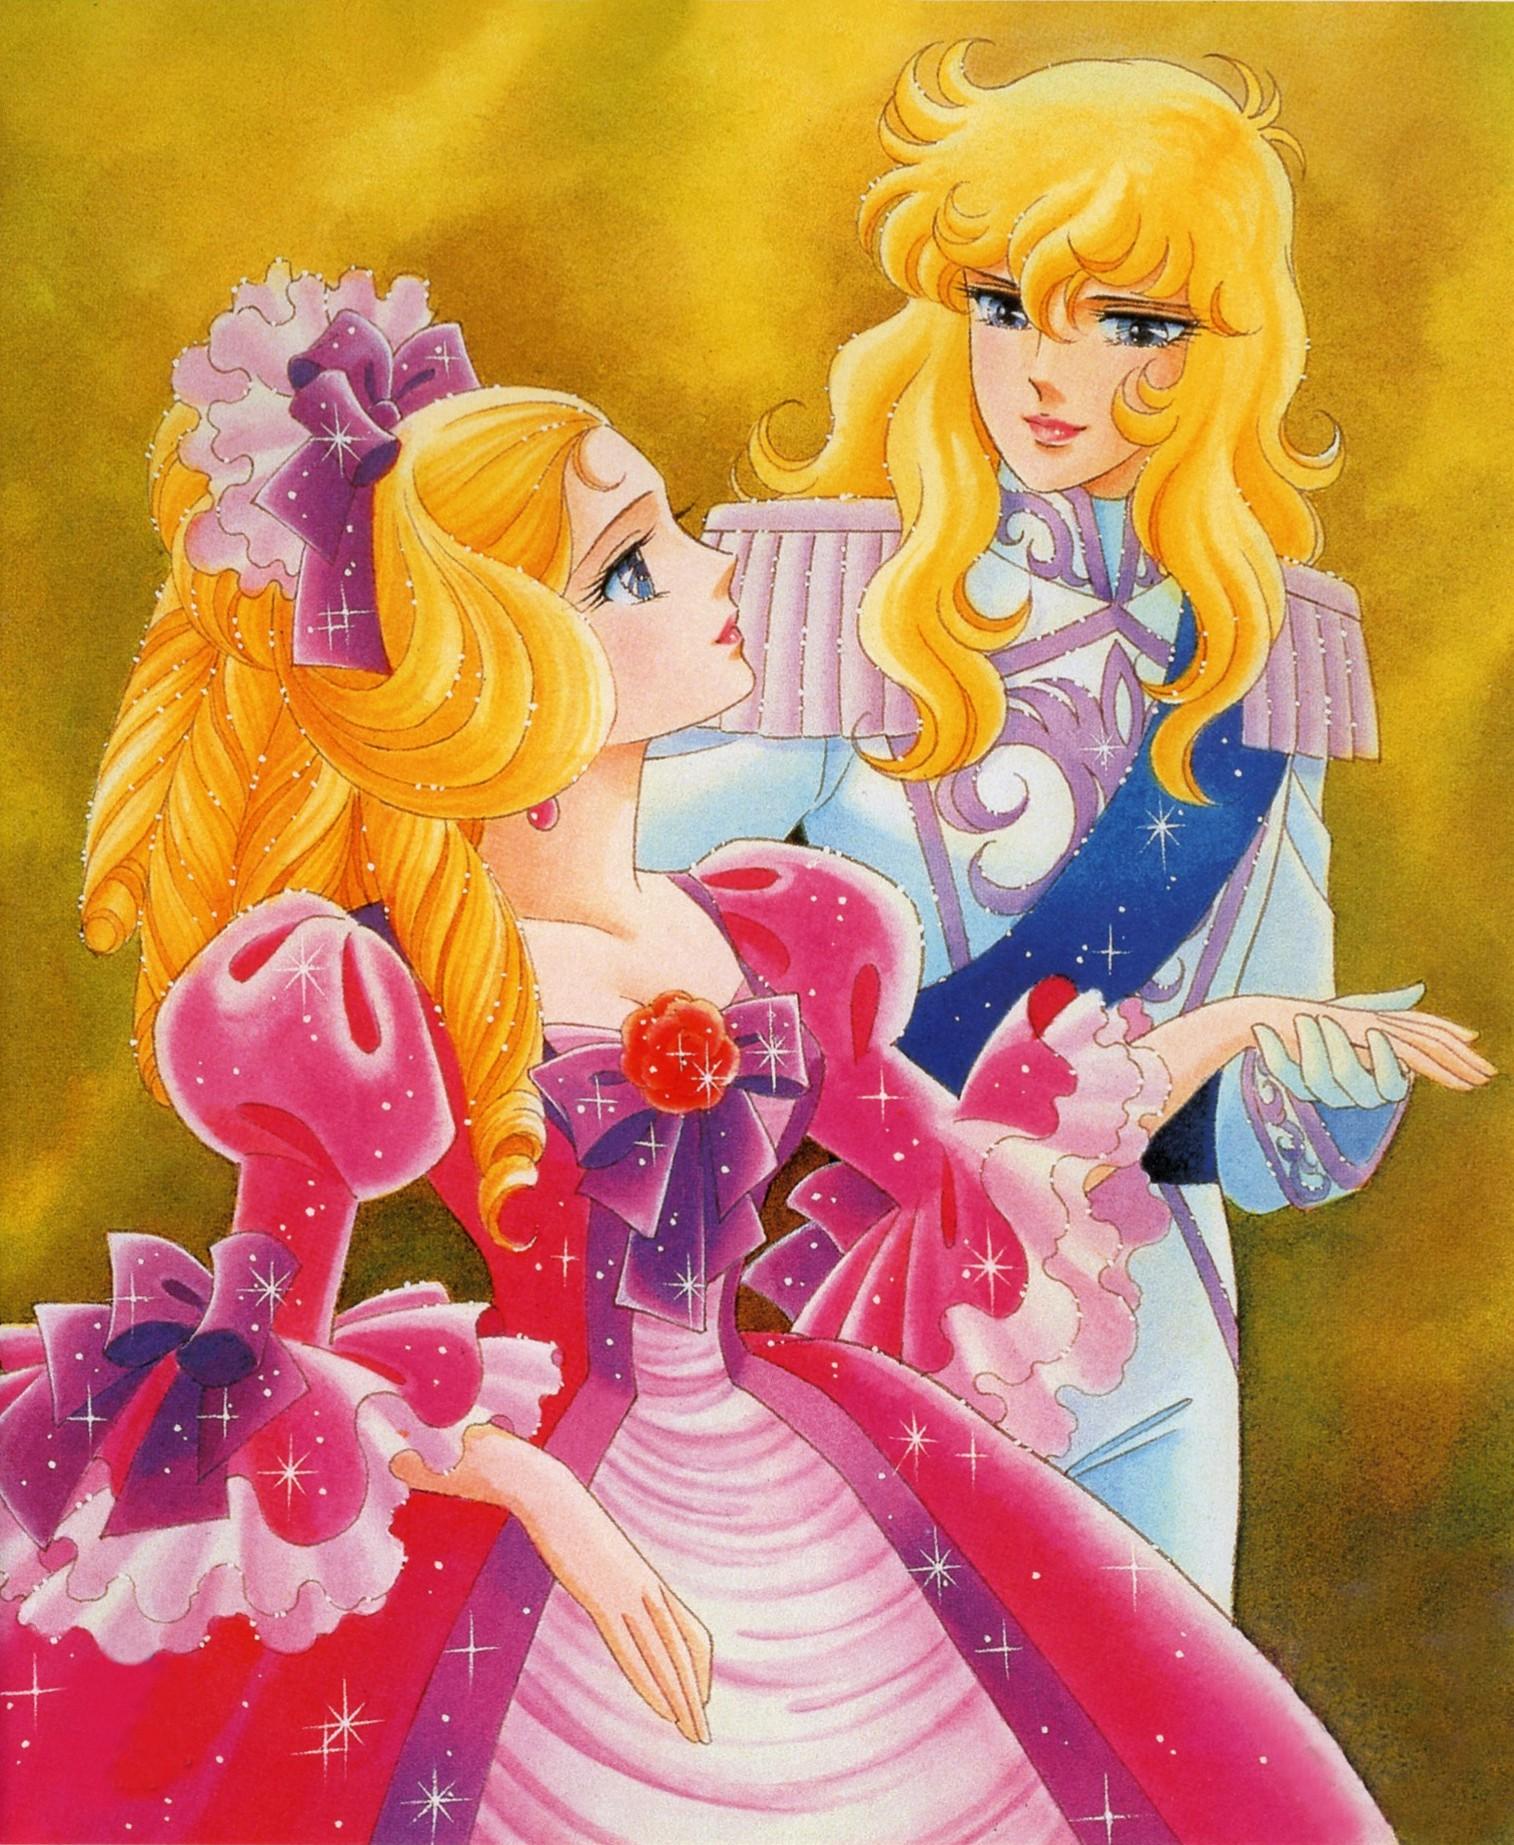 Innamorati dei cartoni animati lady oscar